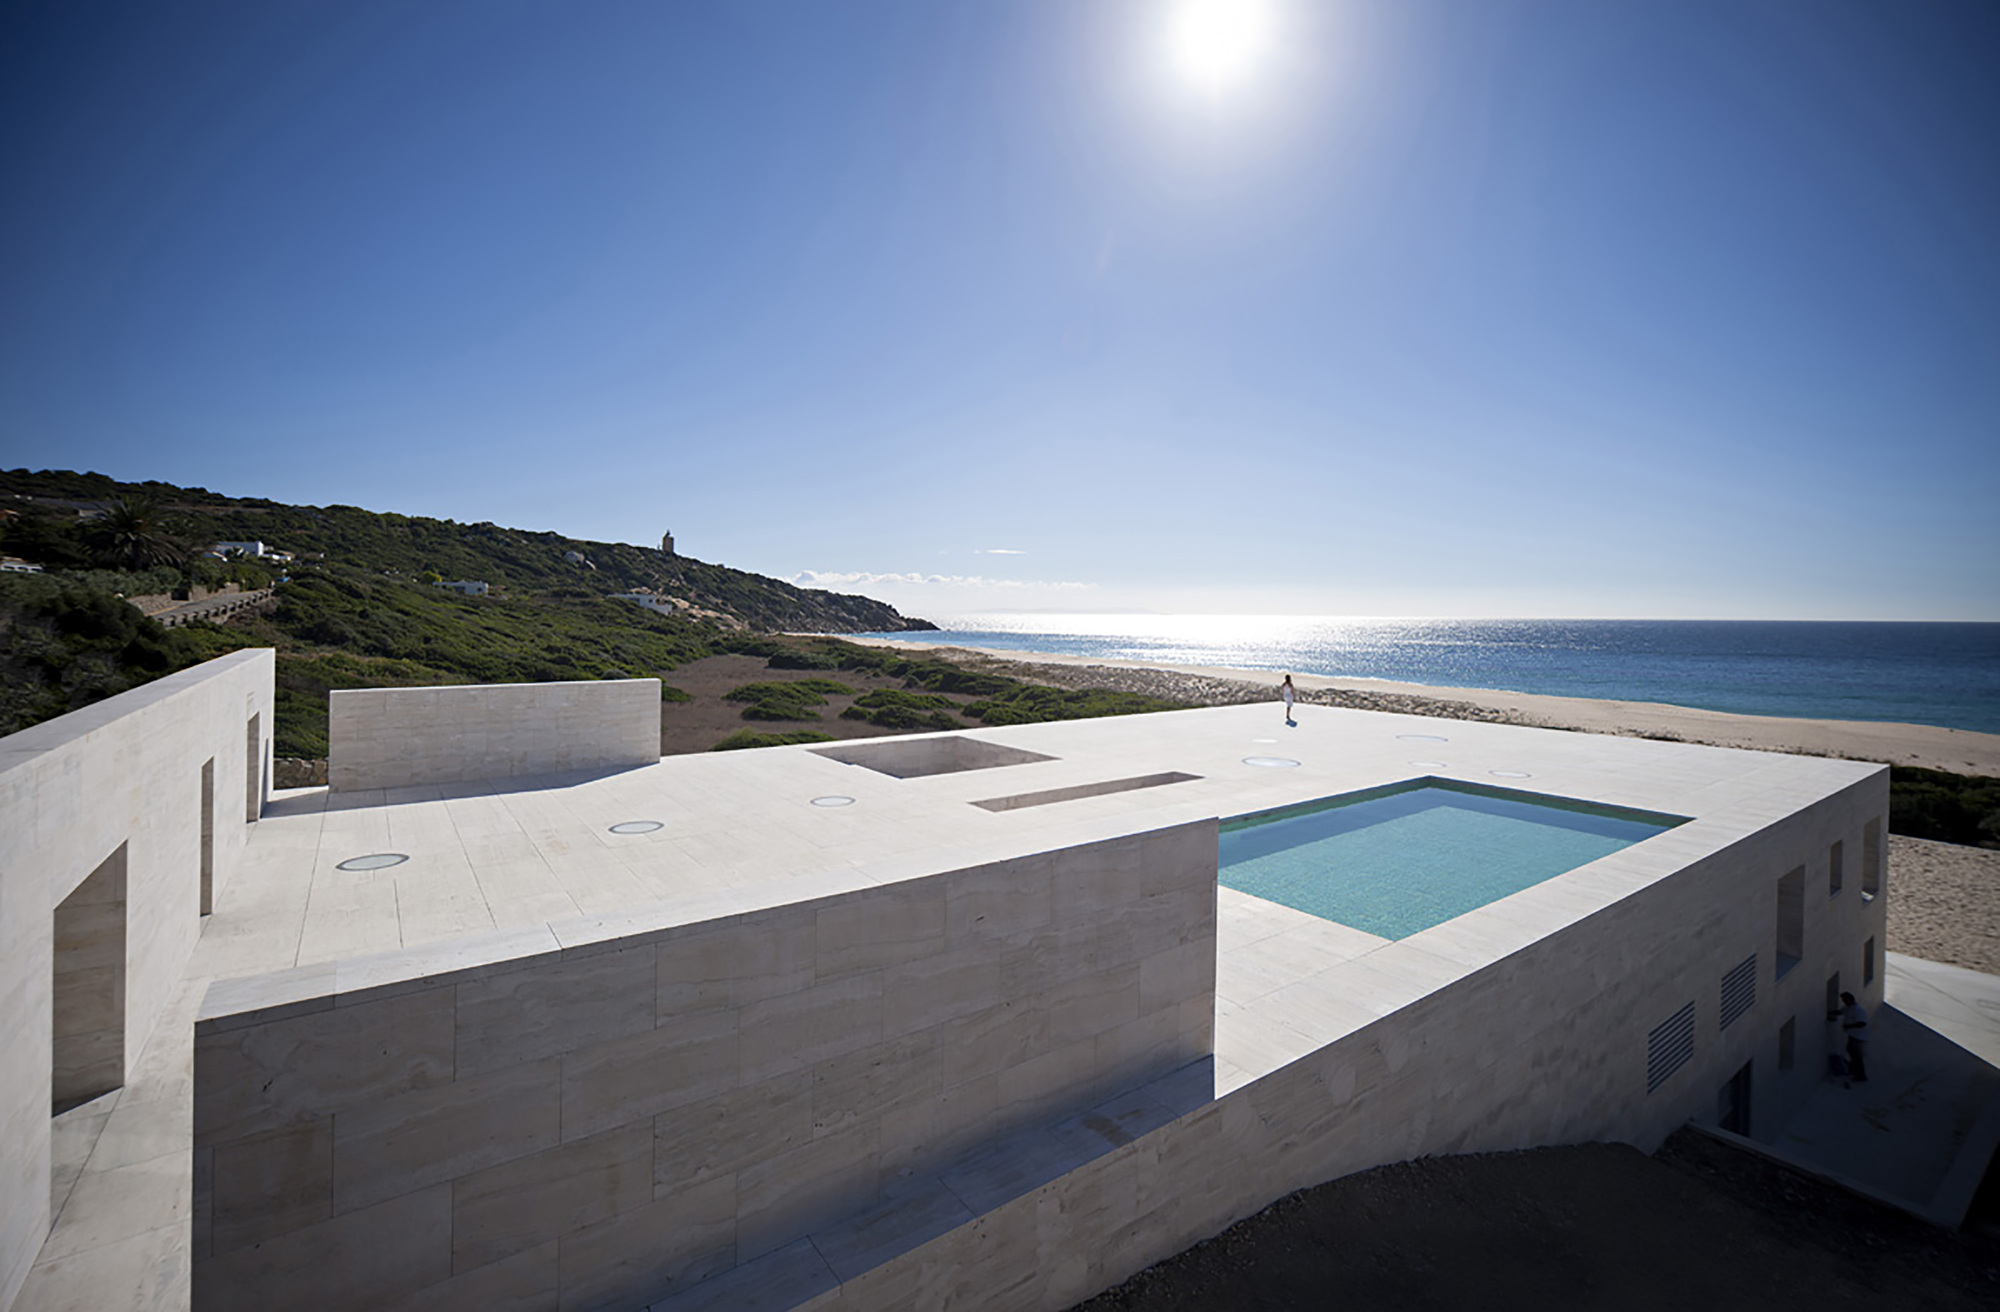 alberto campo baeza the house of the infinite hic arquitectura. Black Bedroom Furniture Sets. Home Design Ideas